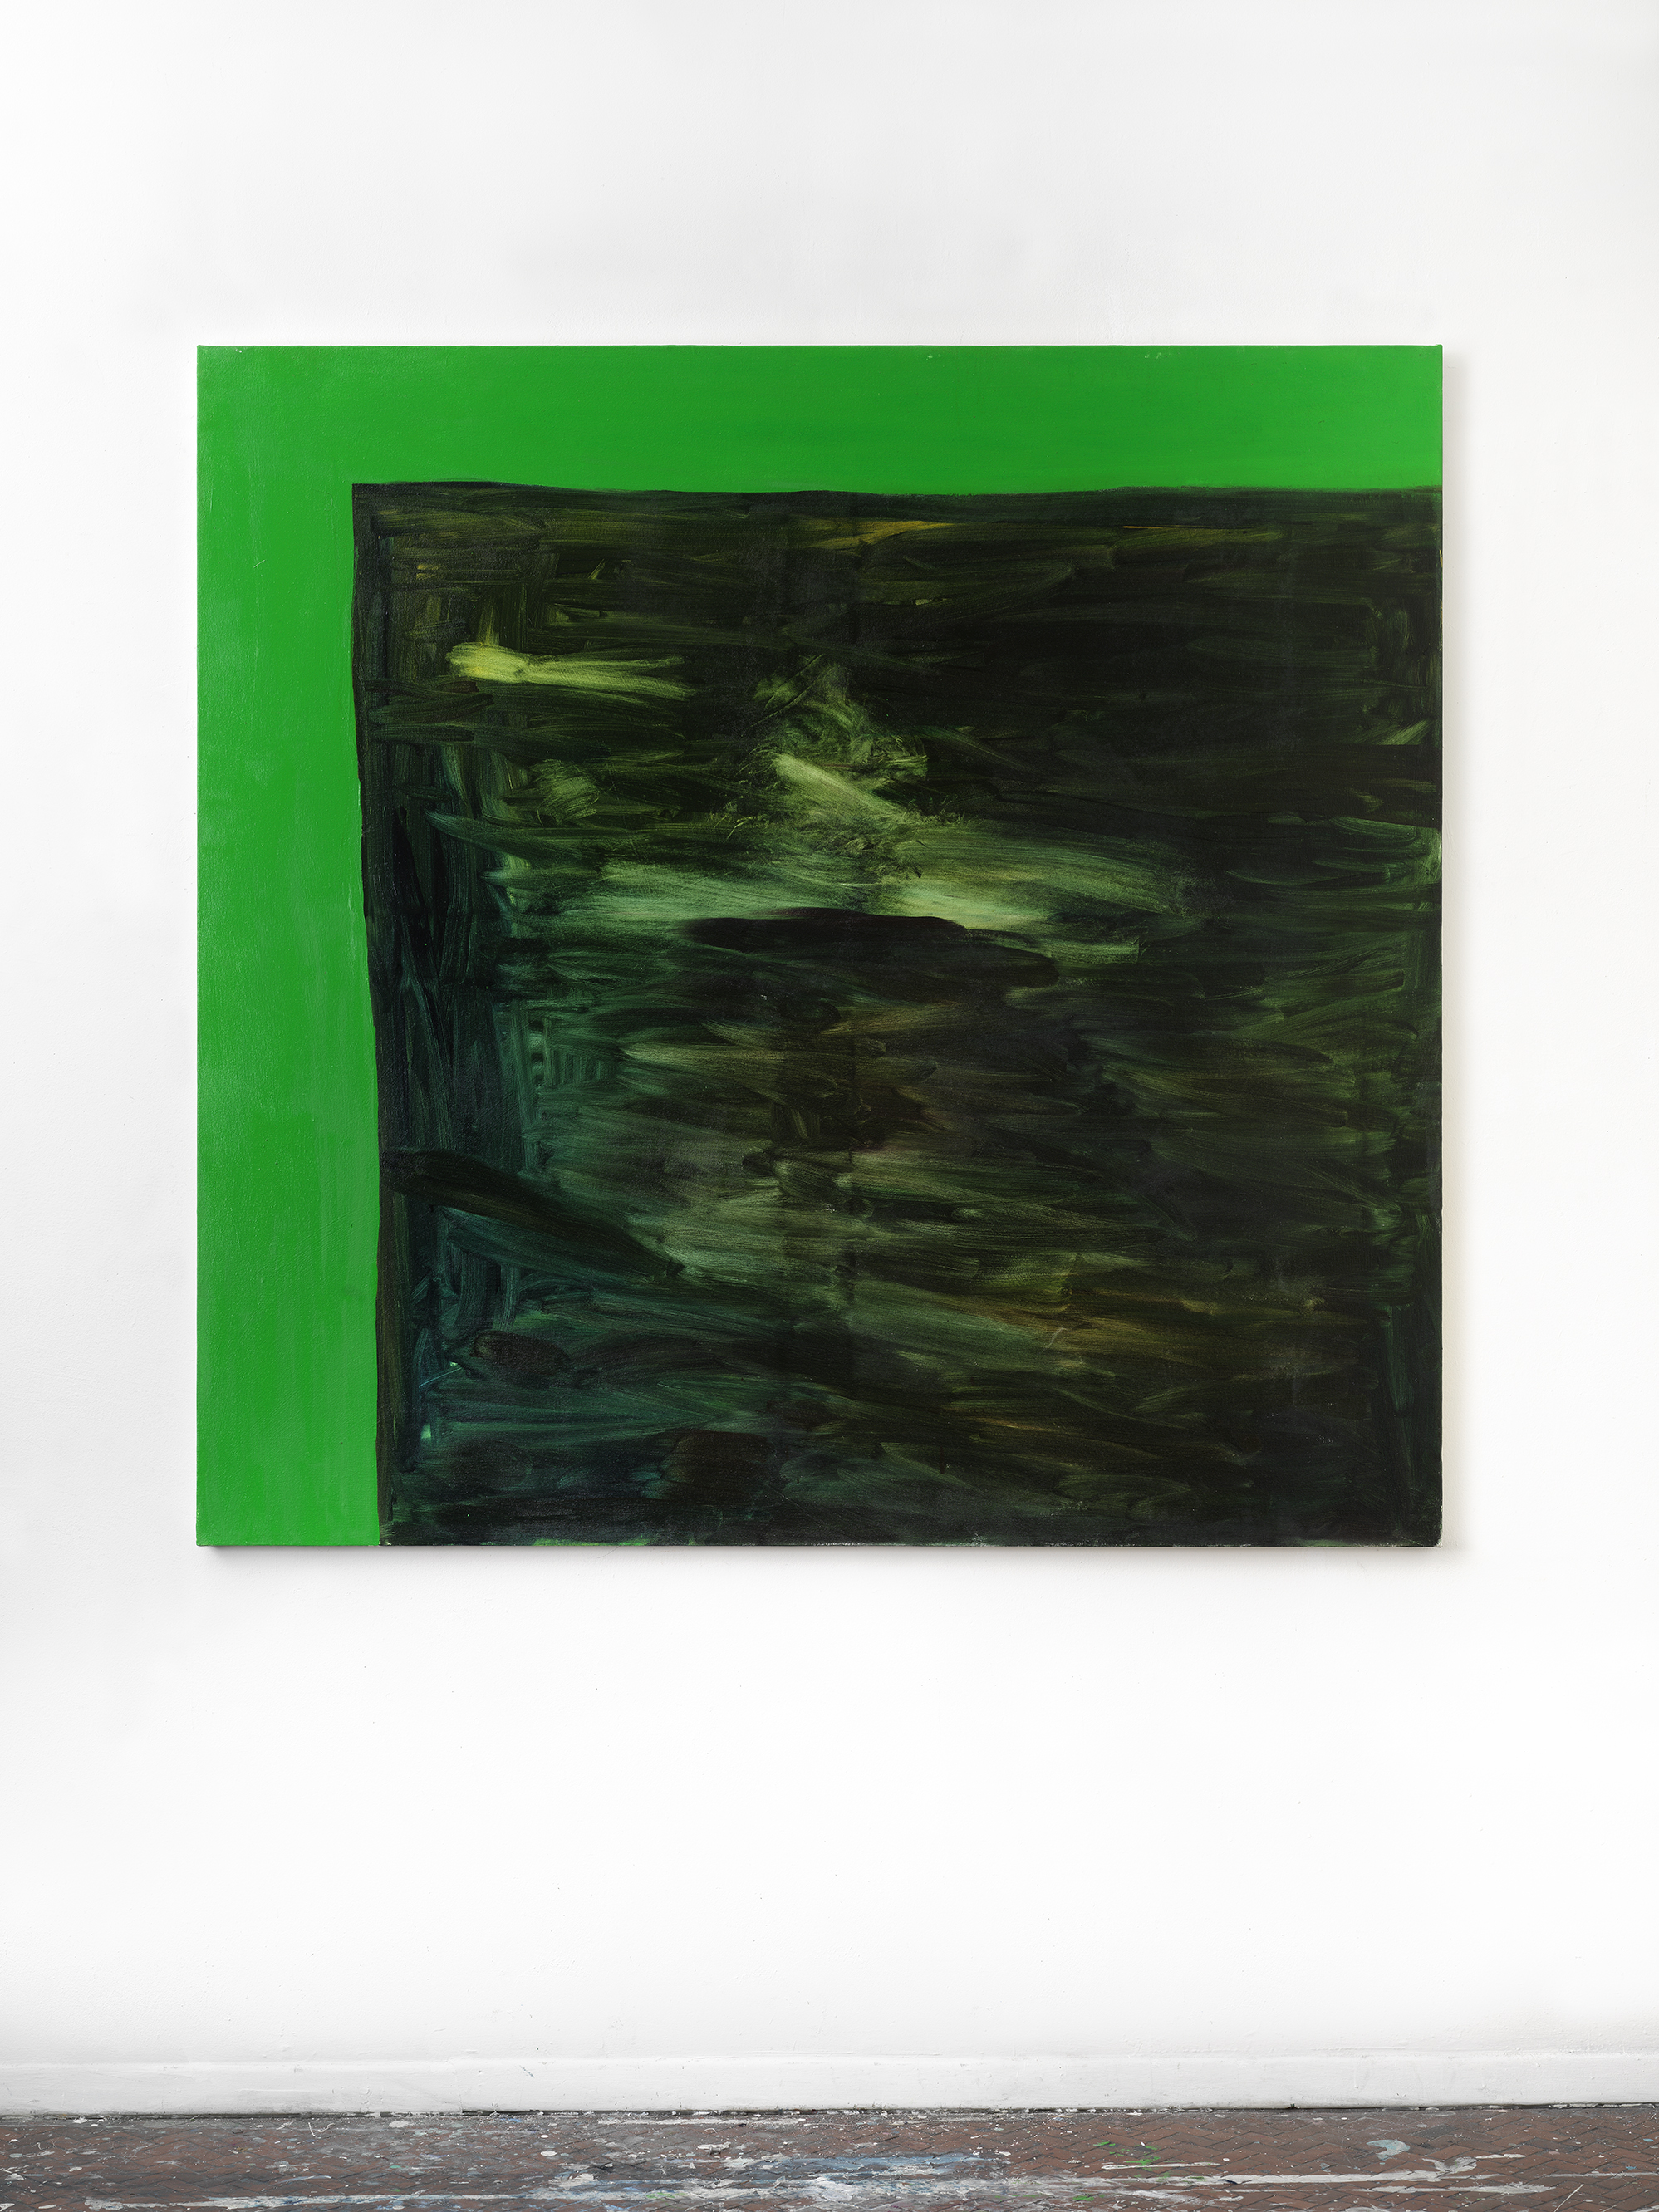 Green Screen #2